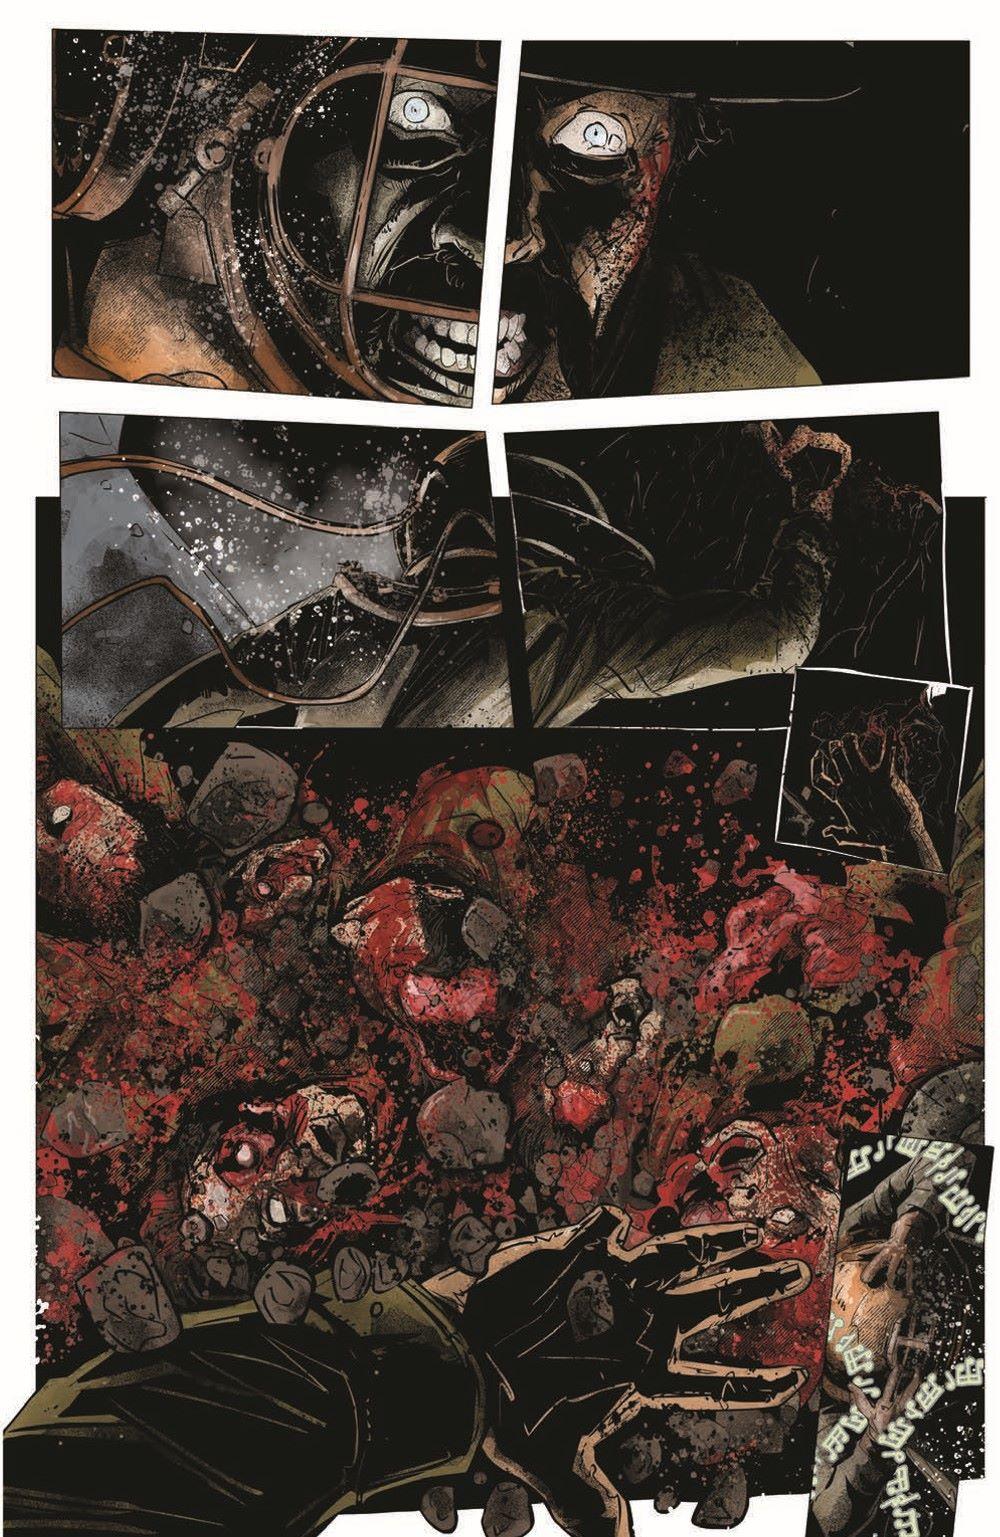 SeaOfSorrow04_pr-3 ComicList Previews: SEA OF SORROWS #4 (OF 5)